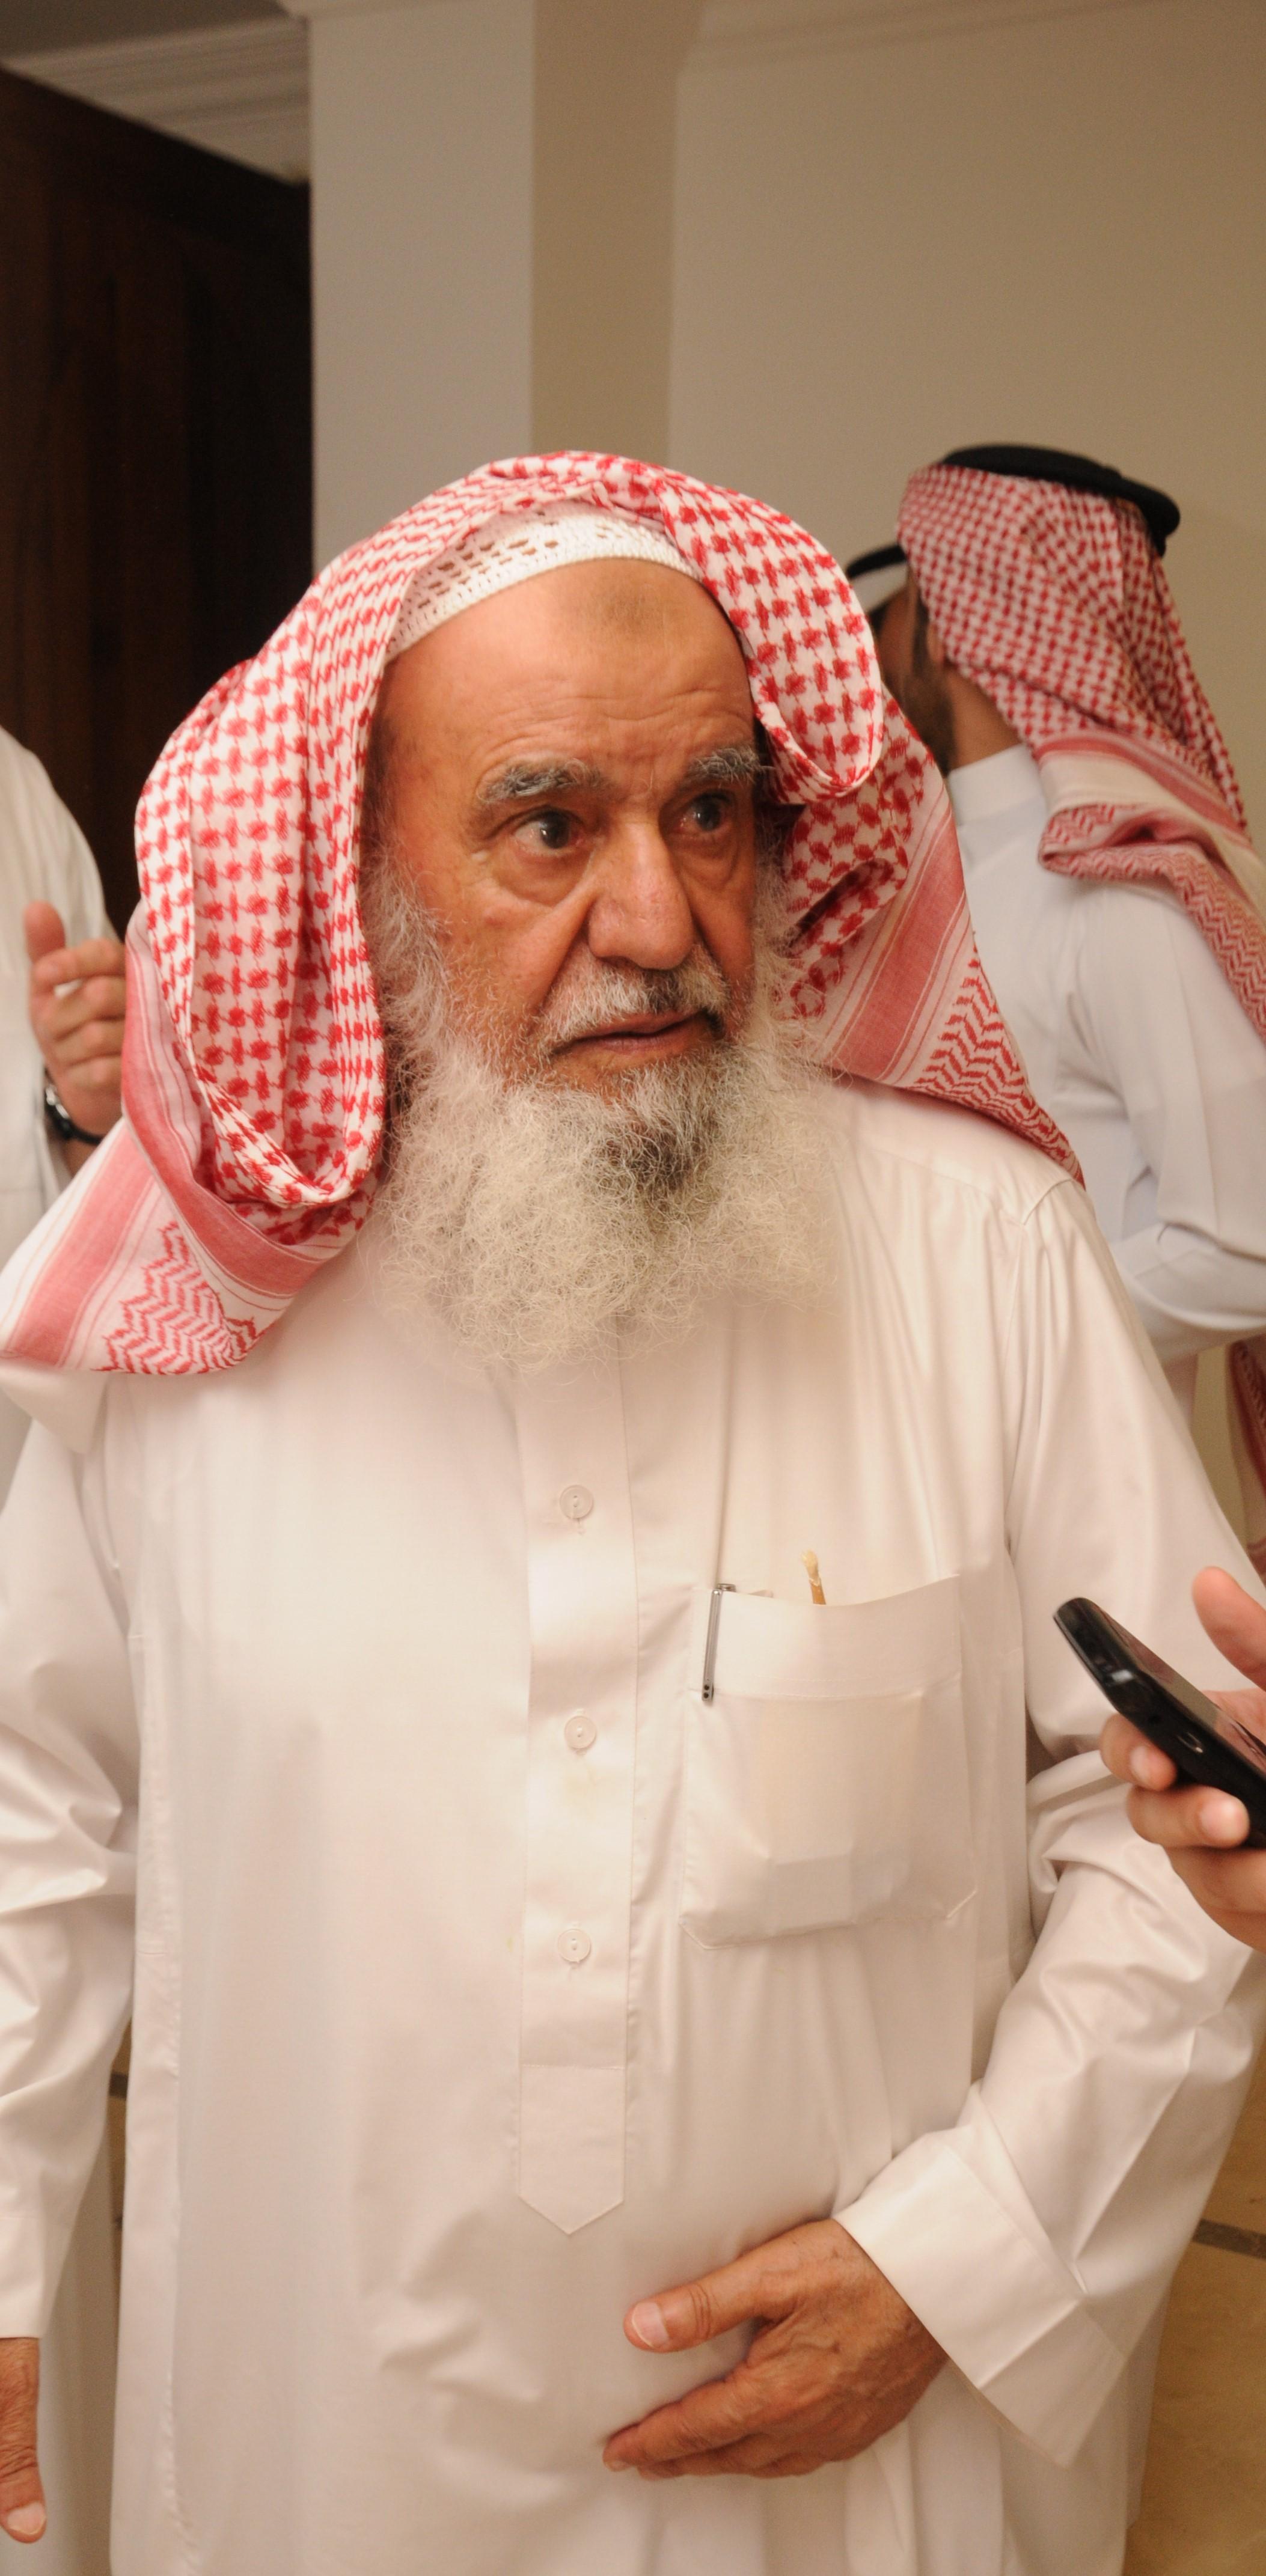 Sulaiman Abdul Aziz Al Rajhi - Wikipedia